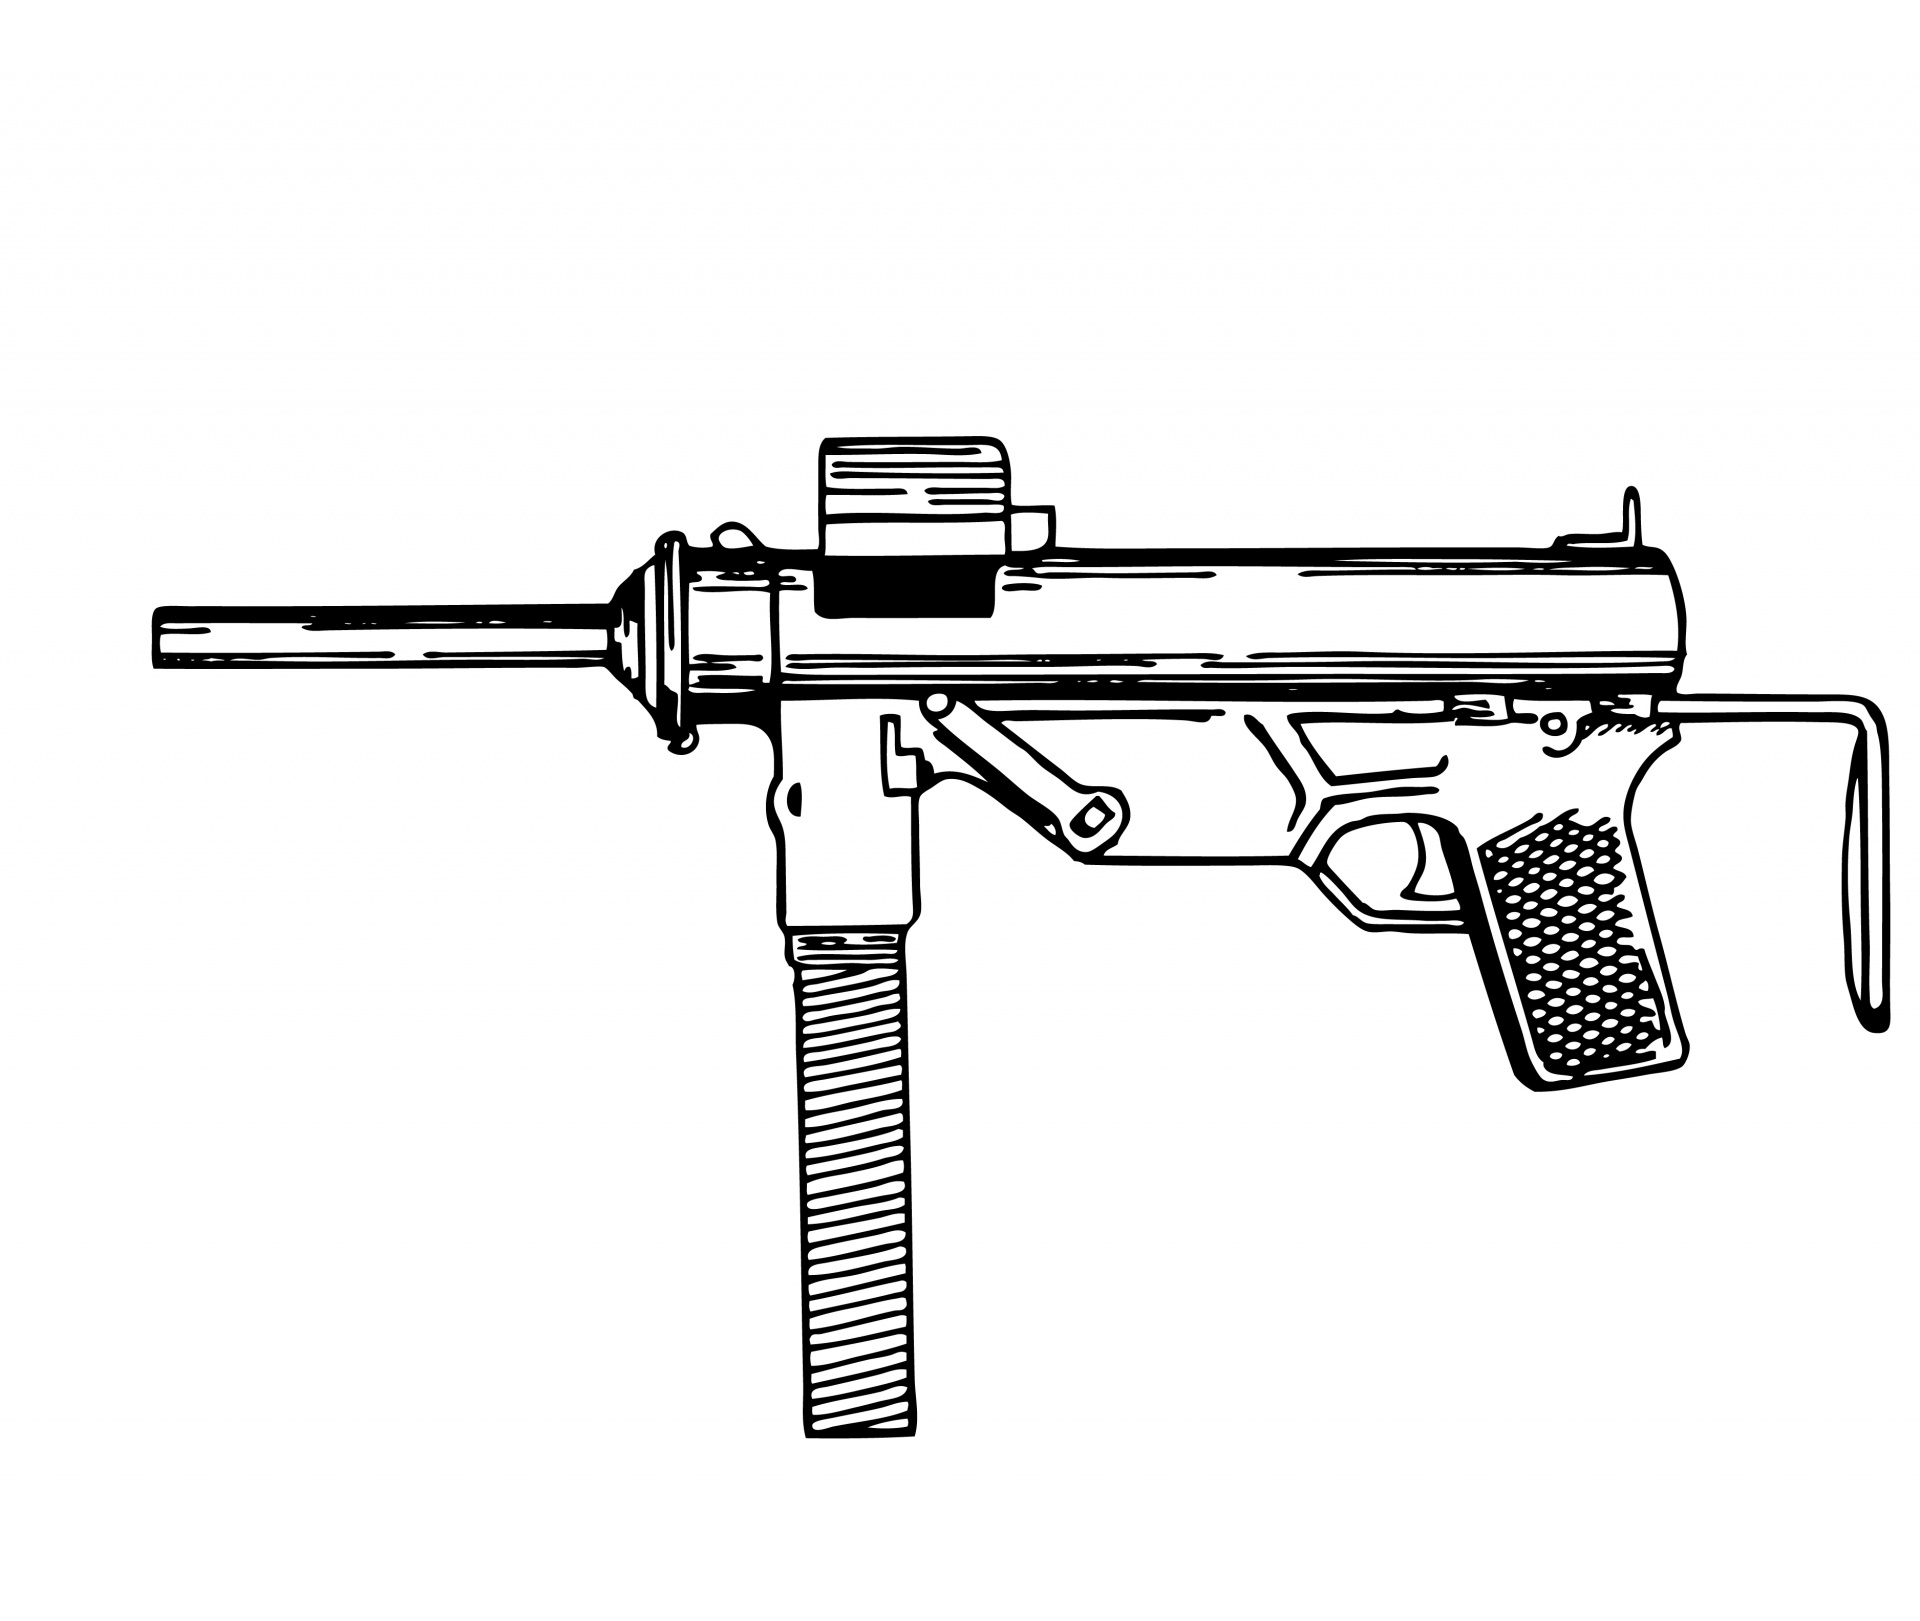 Illustration clipart gun Gun Public Stock Submachine Illustration